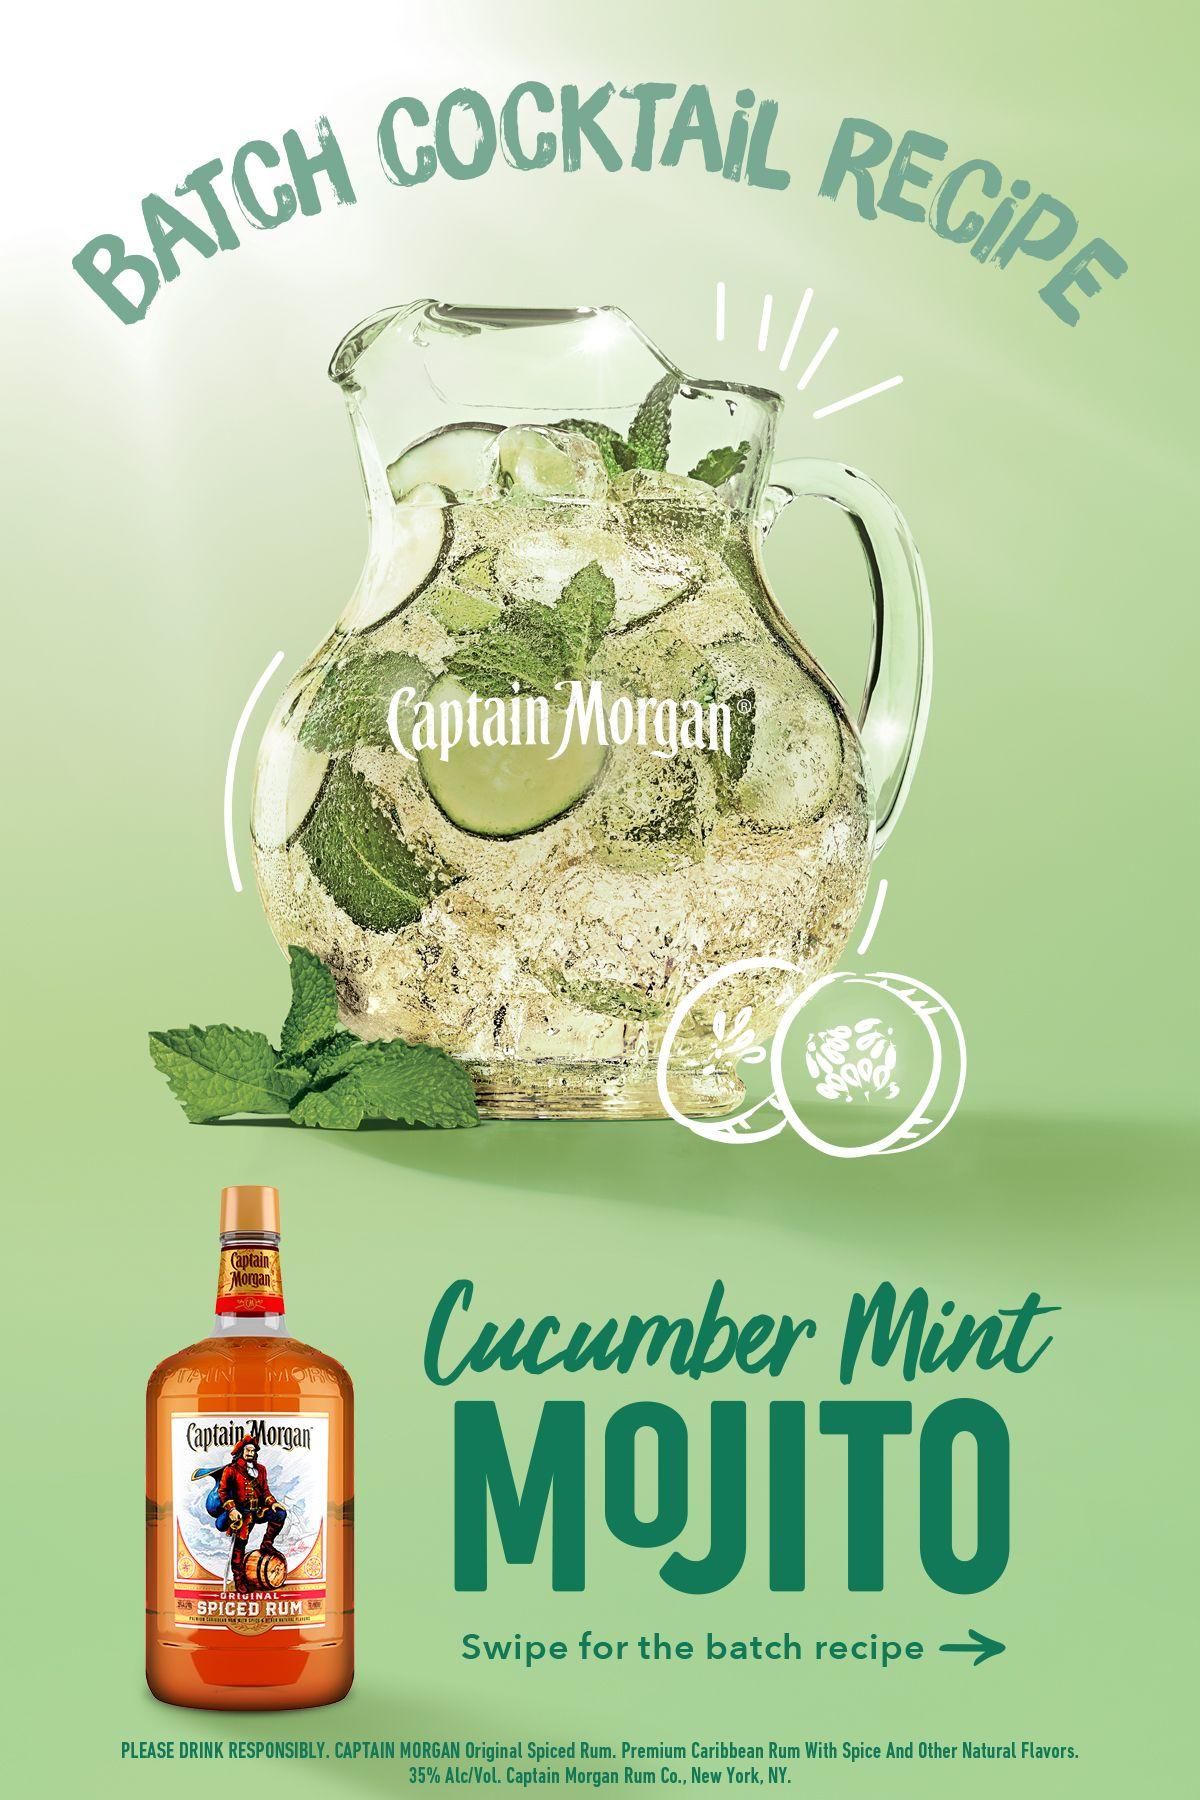 Xl Captain Morgan Cucumber Mint Mojito Batch Coctail Recipe Mojito Mojito Recipe Batch Cocktail Recipe